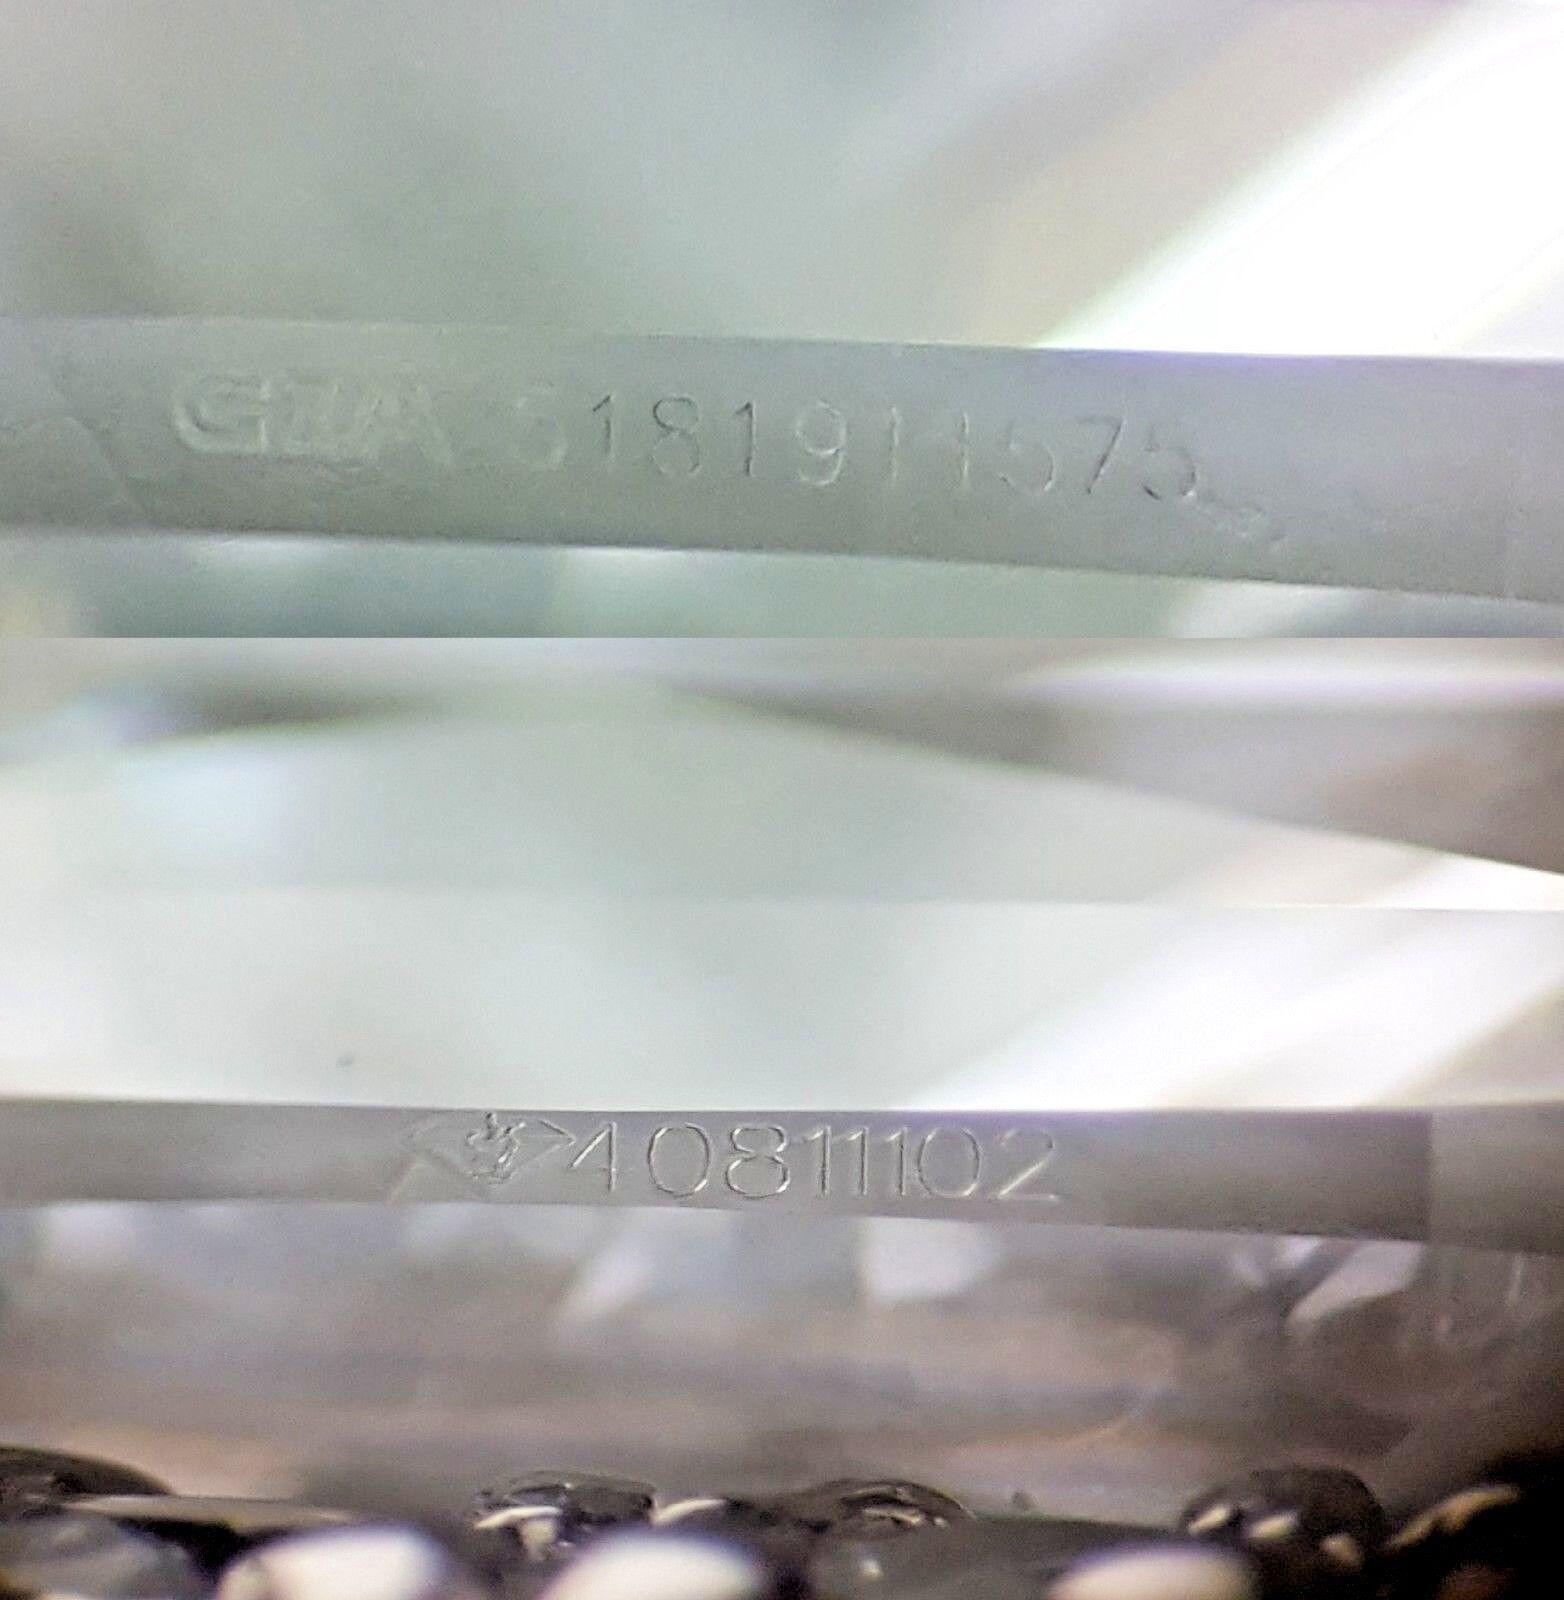 0.97 ct 18K White Gold Cushion Cut Diamond Double Halo Engagement Ring GIA E/VS1 6